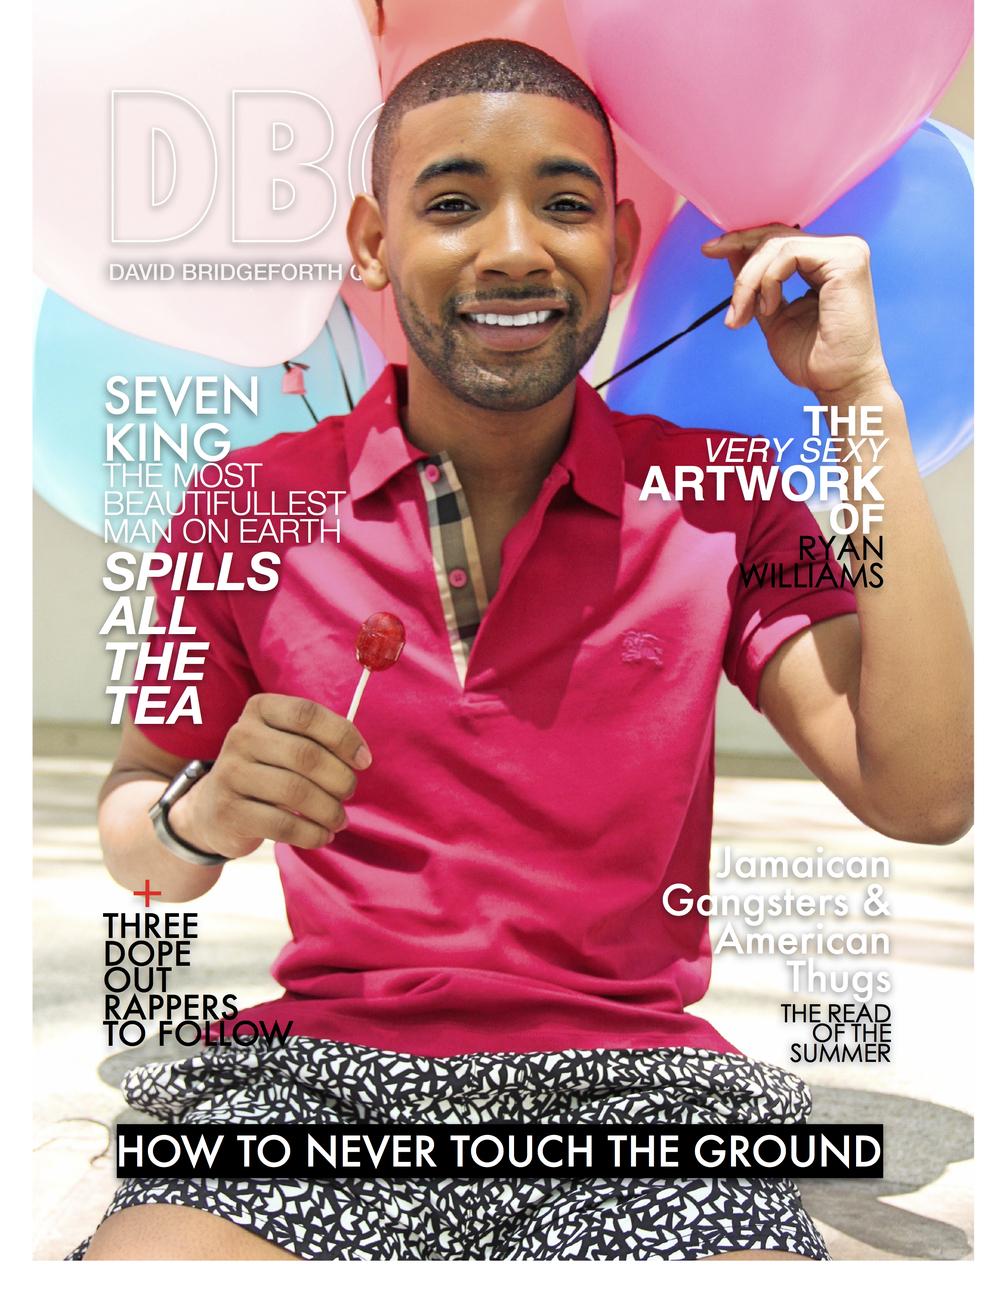 DBQ Magazine Summer 16 Cover FINAL 6:11.jpg